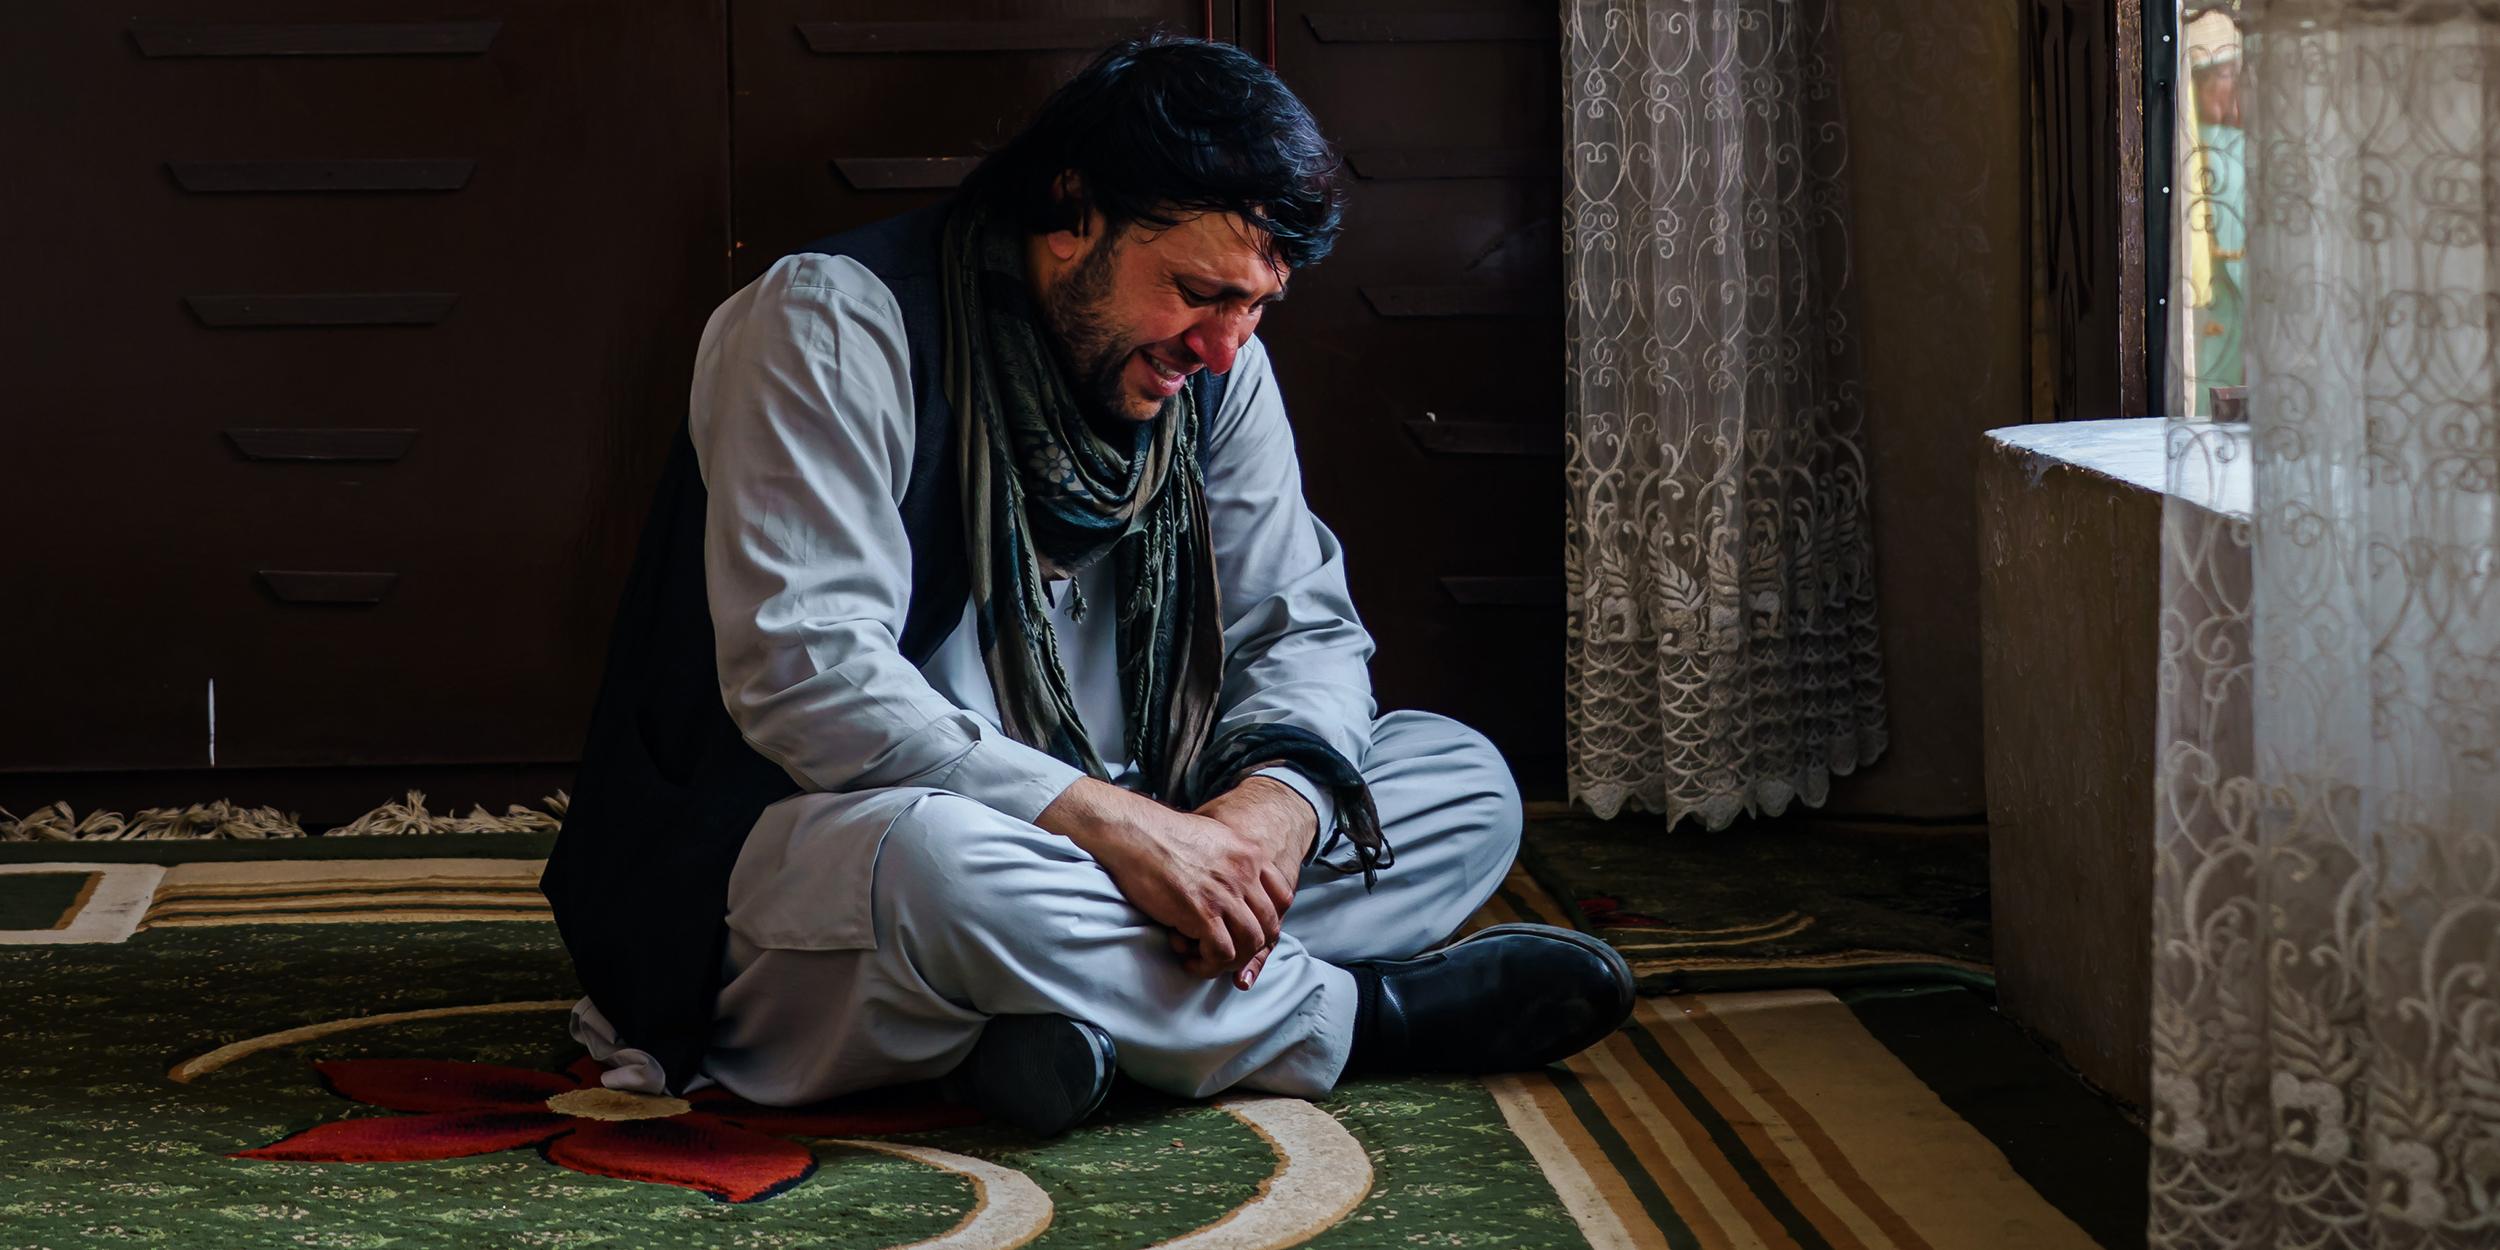 U.S. drone strike in Kabul mistakenly killed civilians, not terrorists, Pentagon says